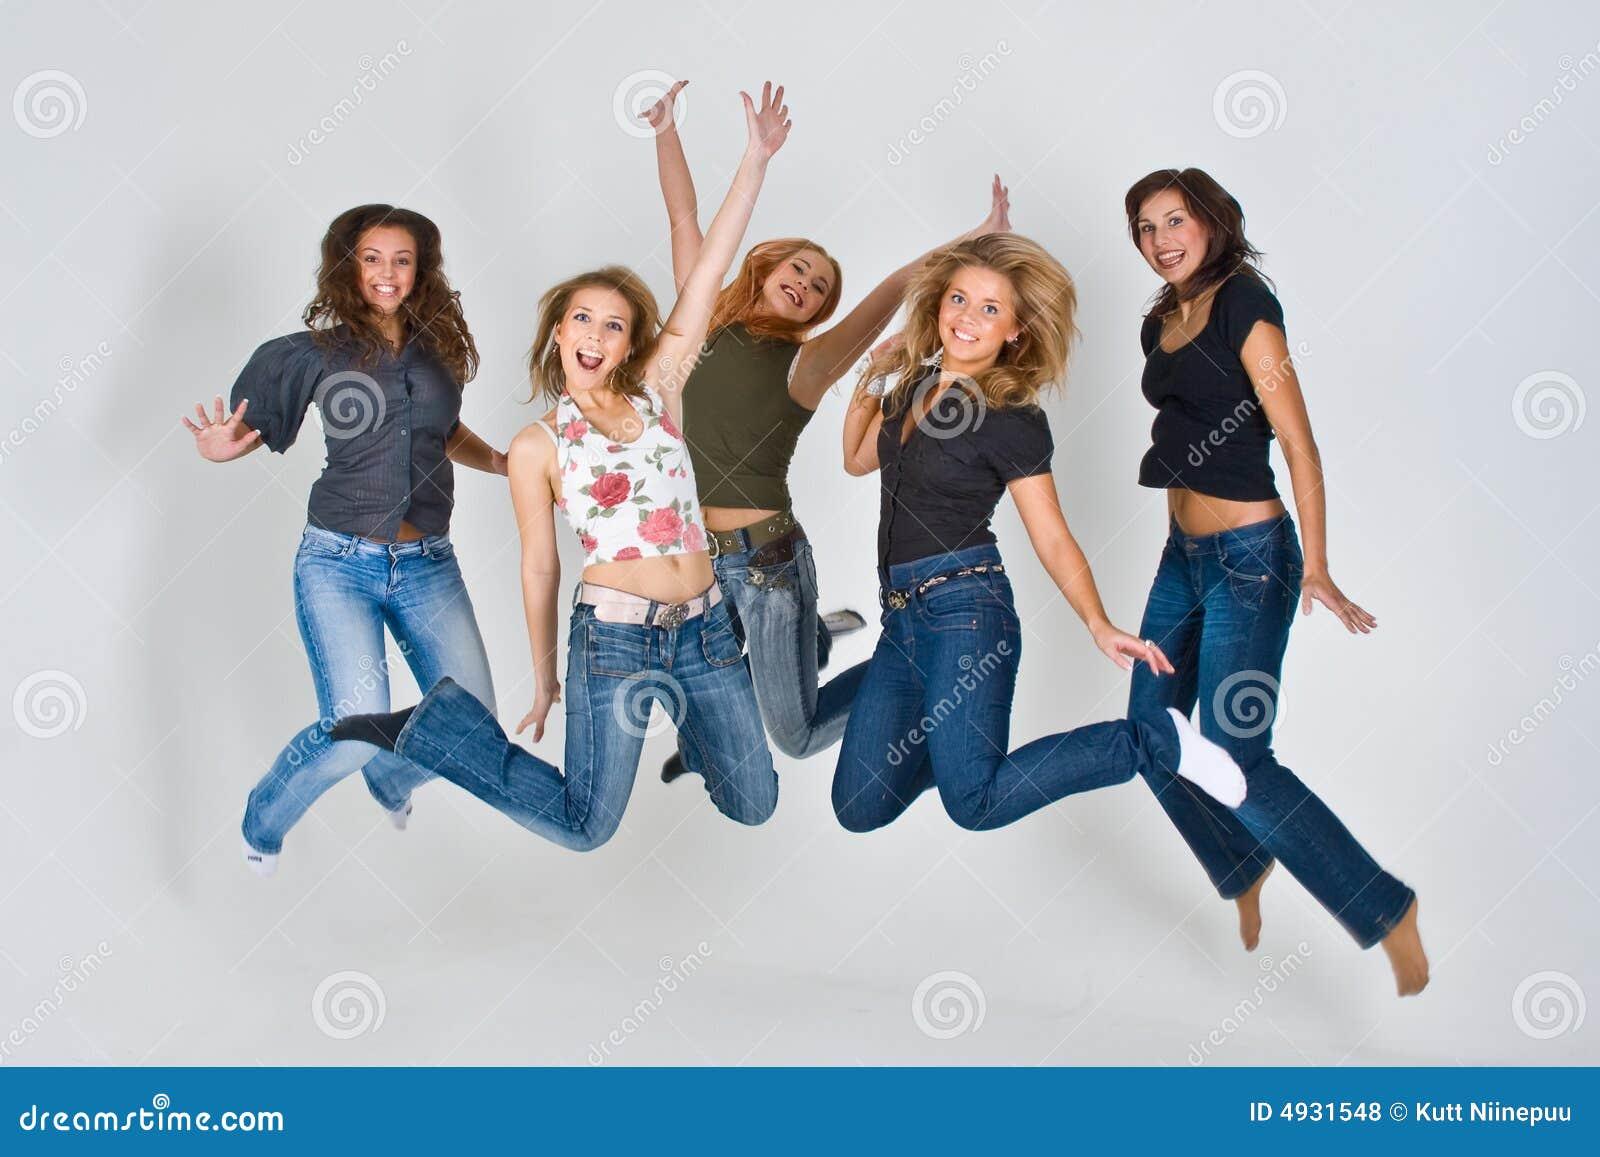 Women jumping in air